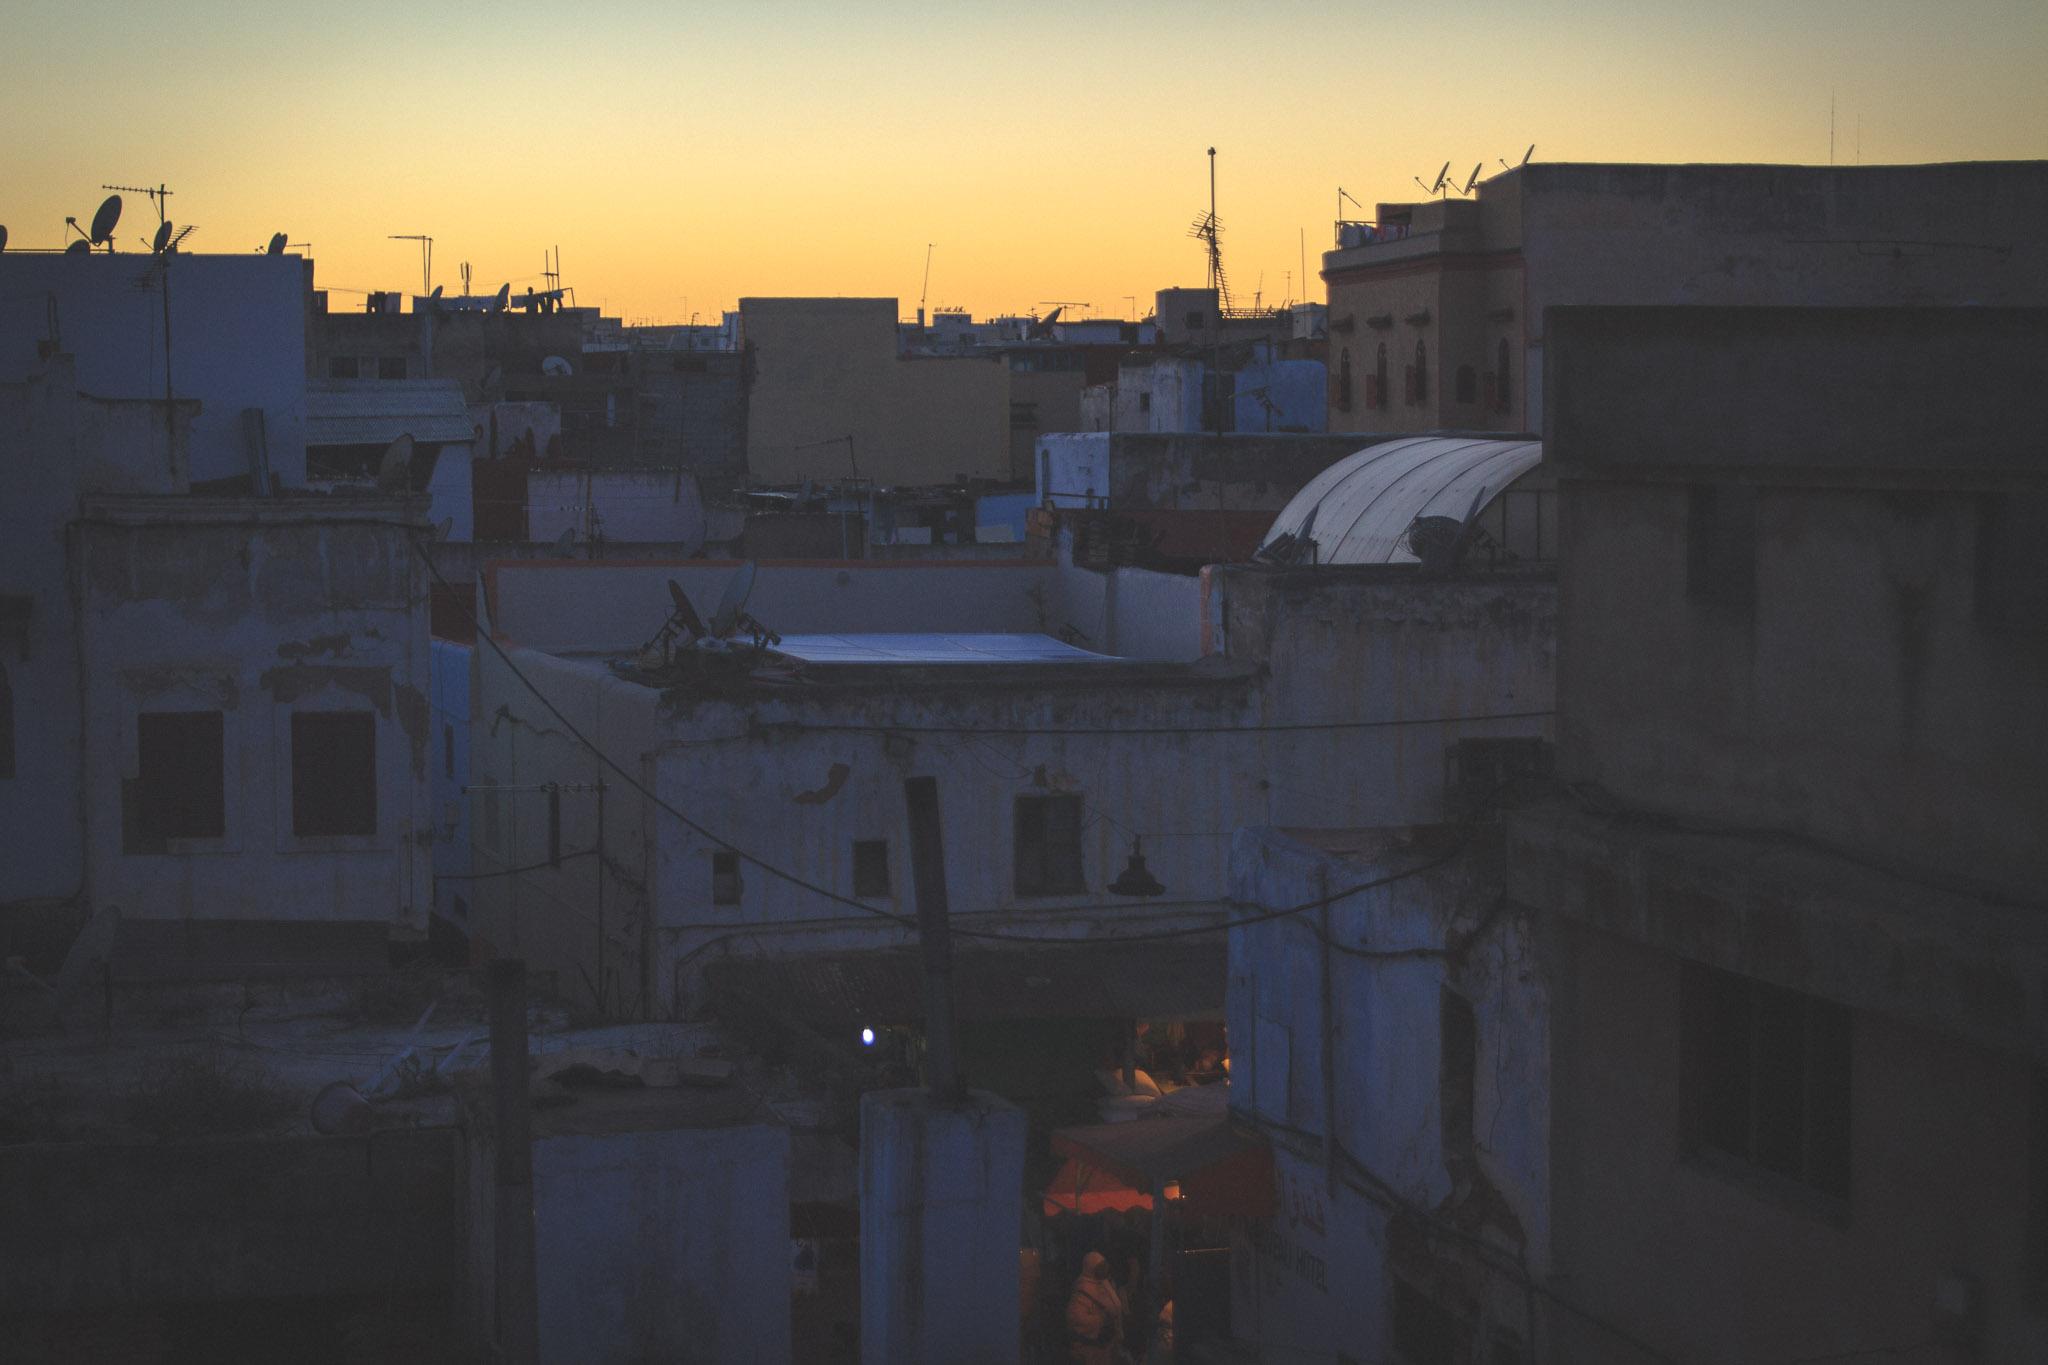 morocco_rabat_fez_casablanca_lesleyade_photography-5.jpg